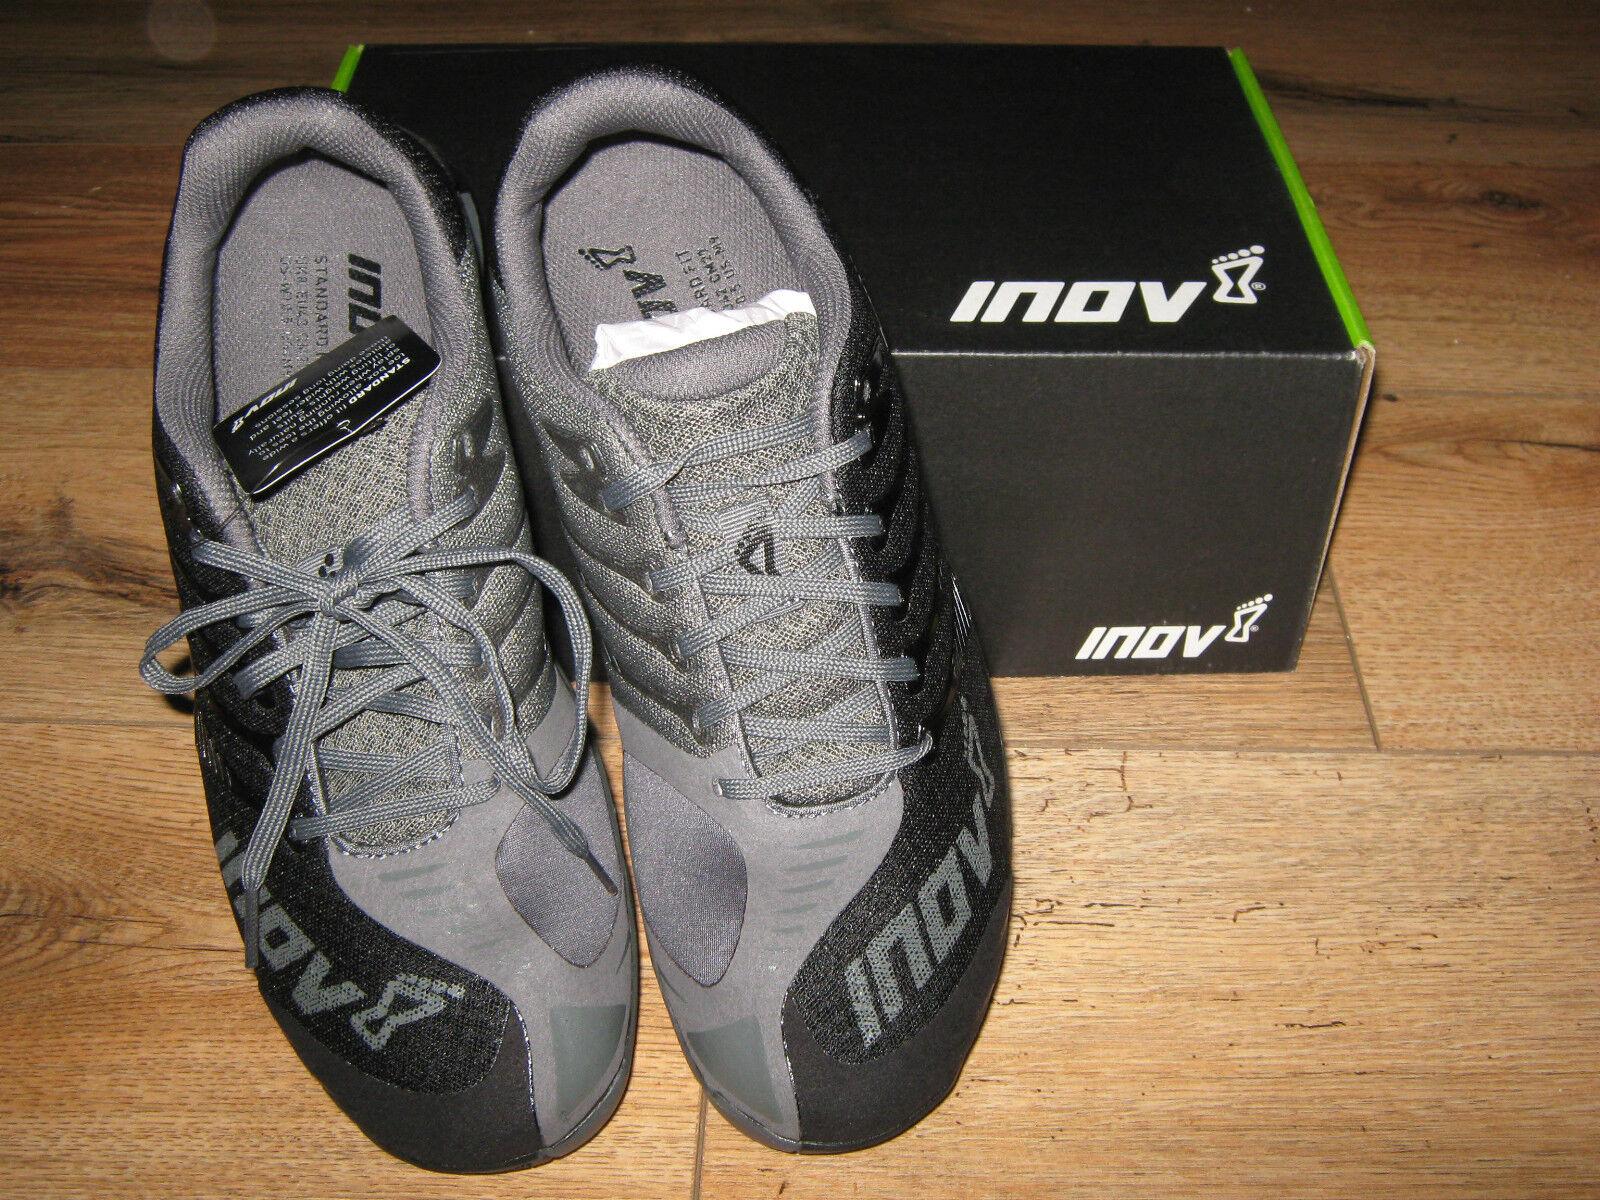 Inov-8 F-Lite 235 Schuhe,Schwarz/Grau,Laufschuhe-Training Gr.37,5